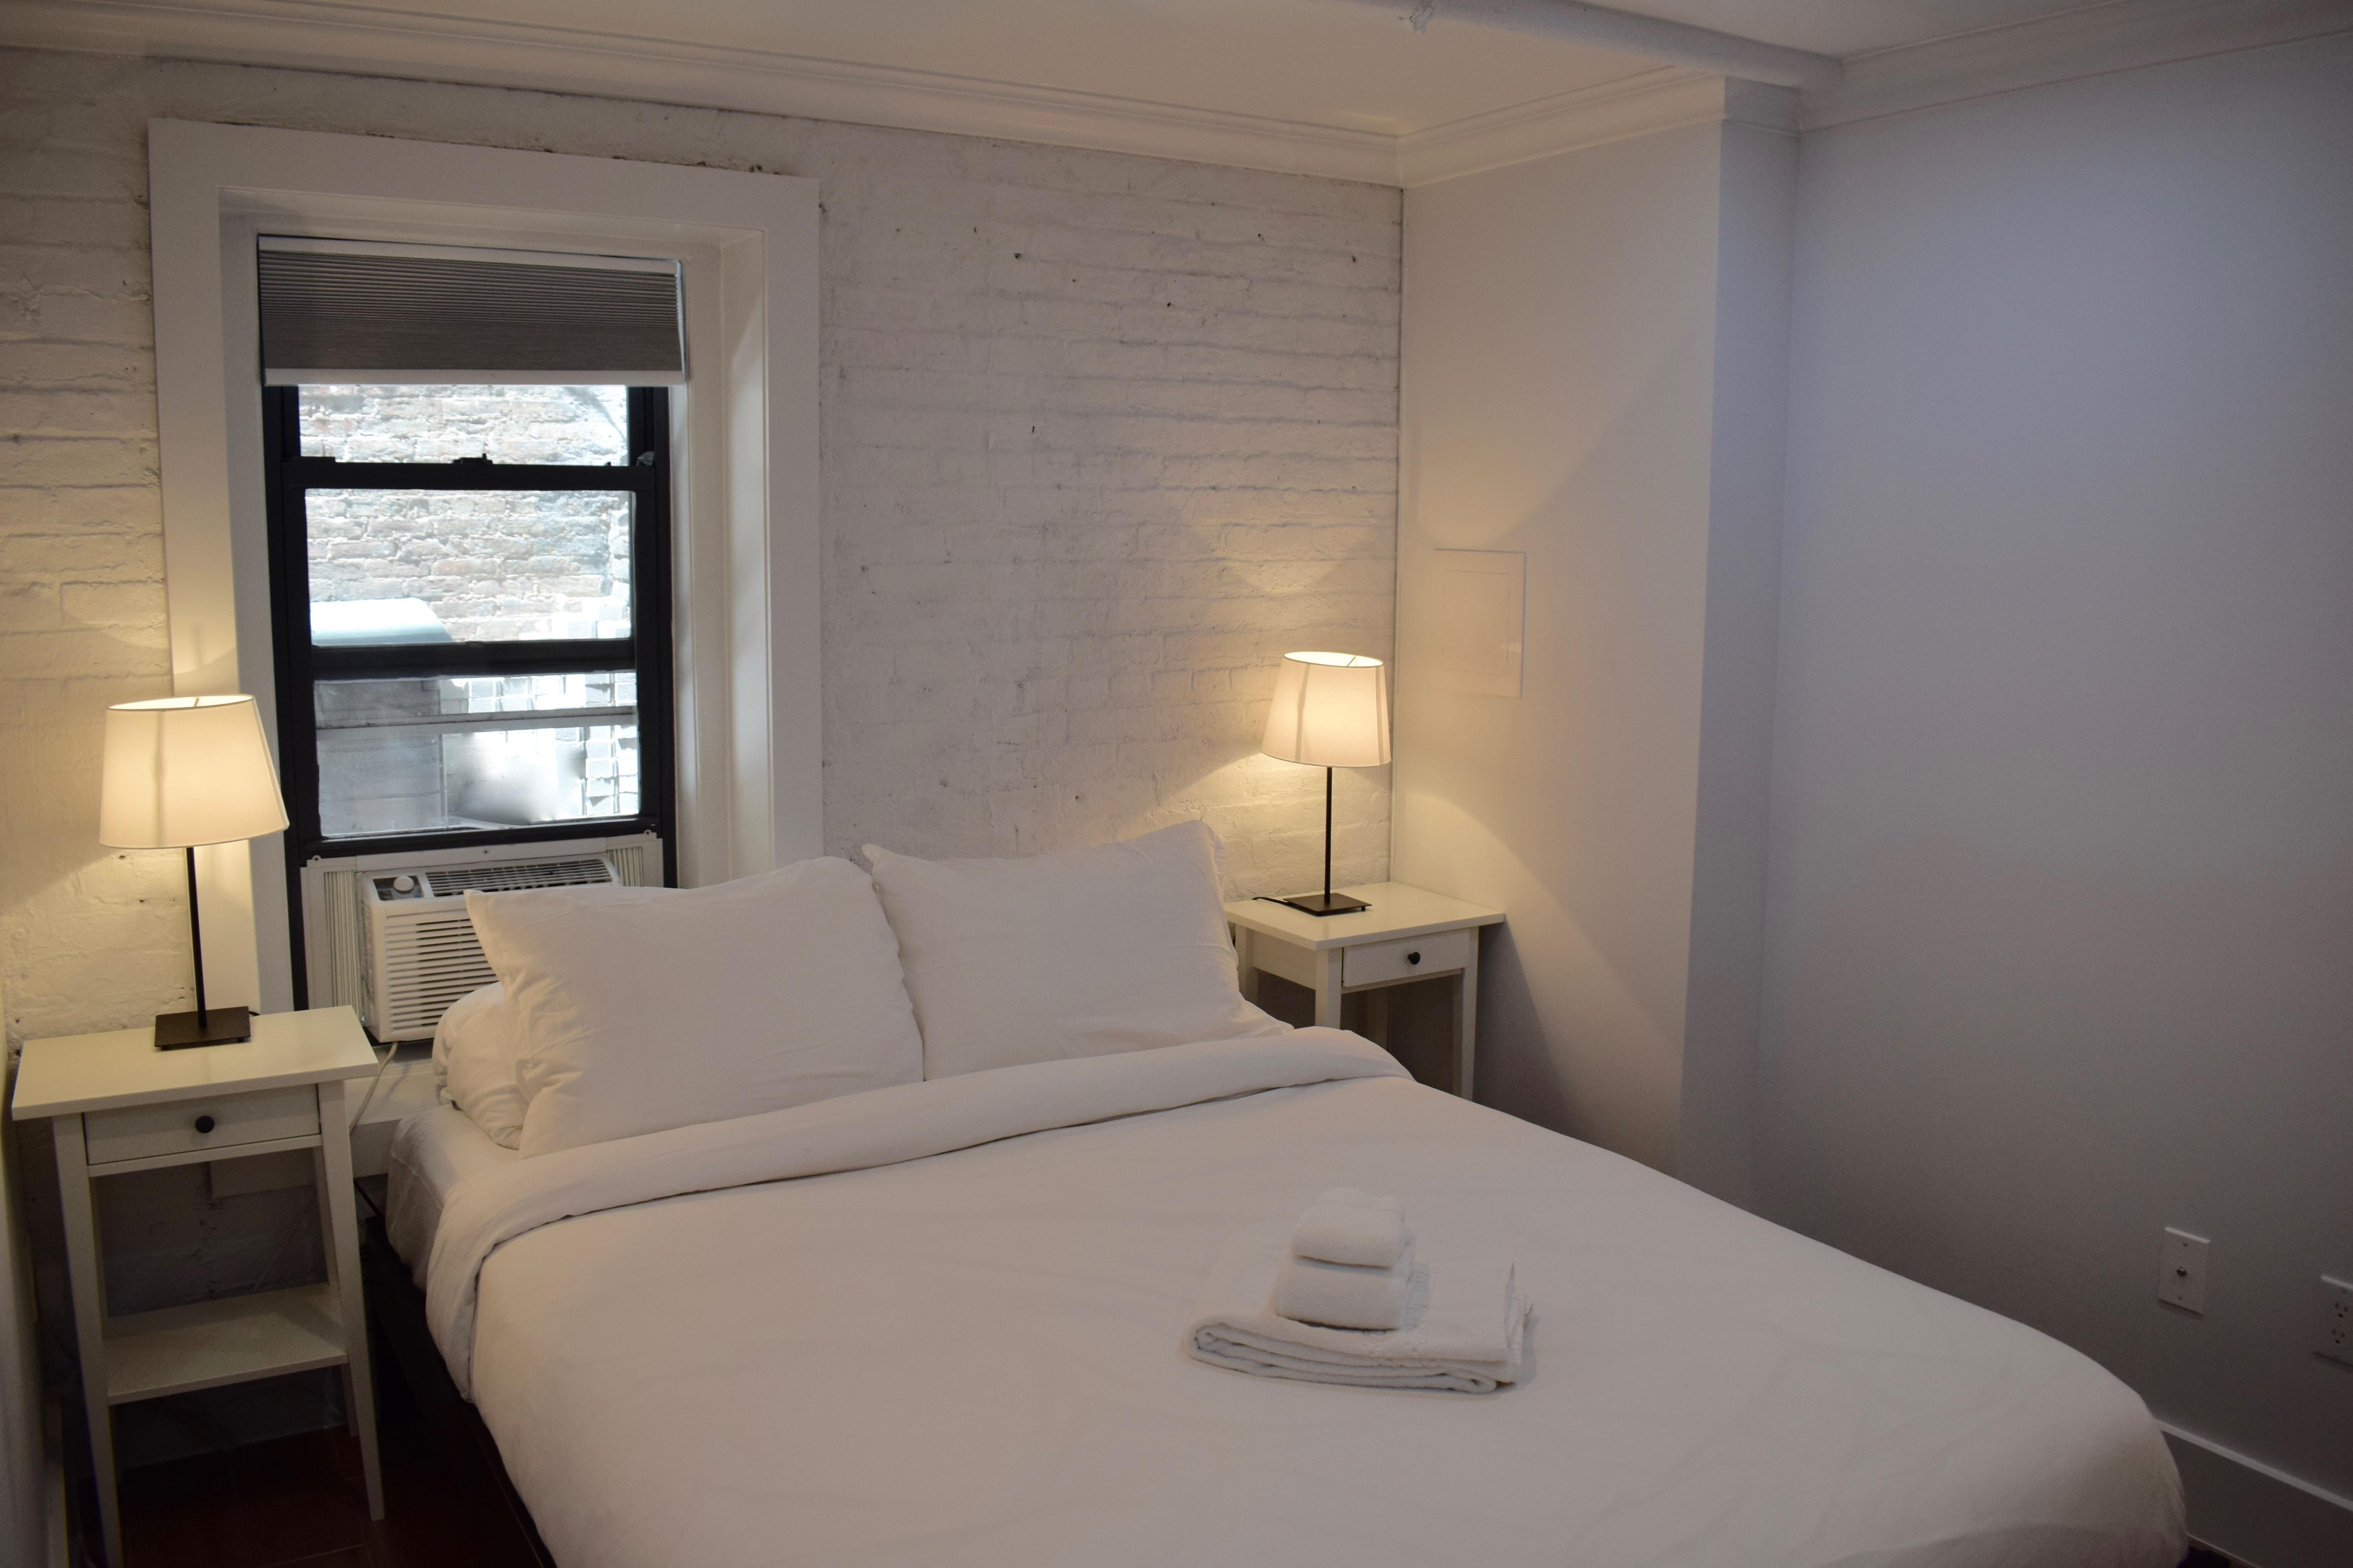 Apartment East Village - Modern Duplex 3BR 2BA Private backyard  photo 5913375